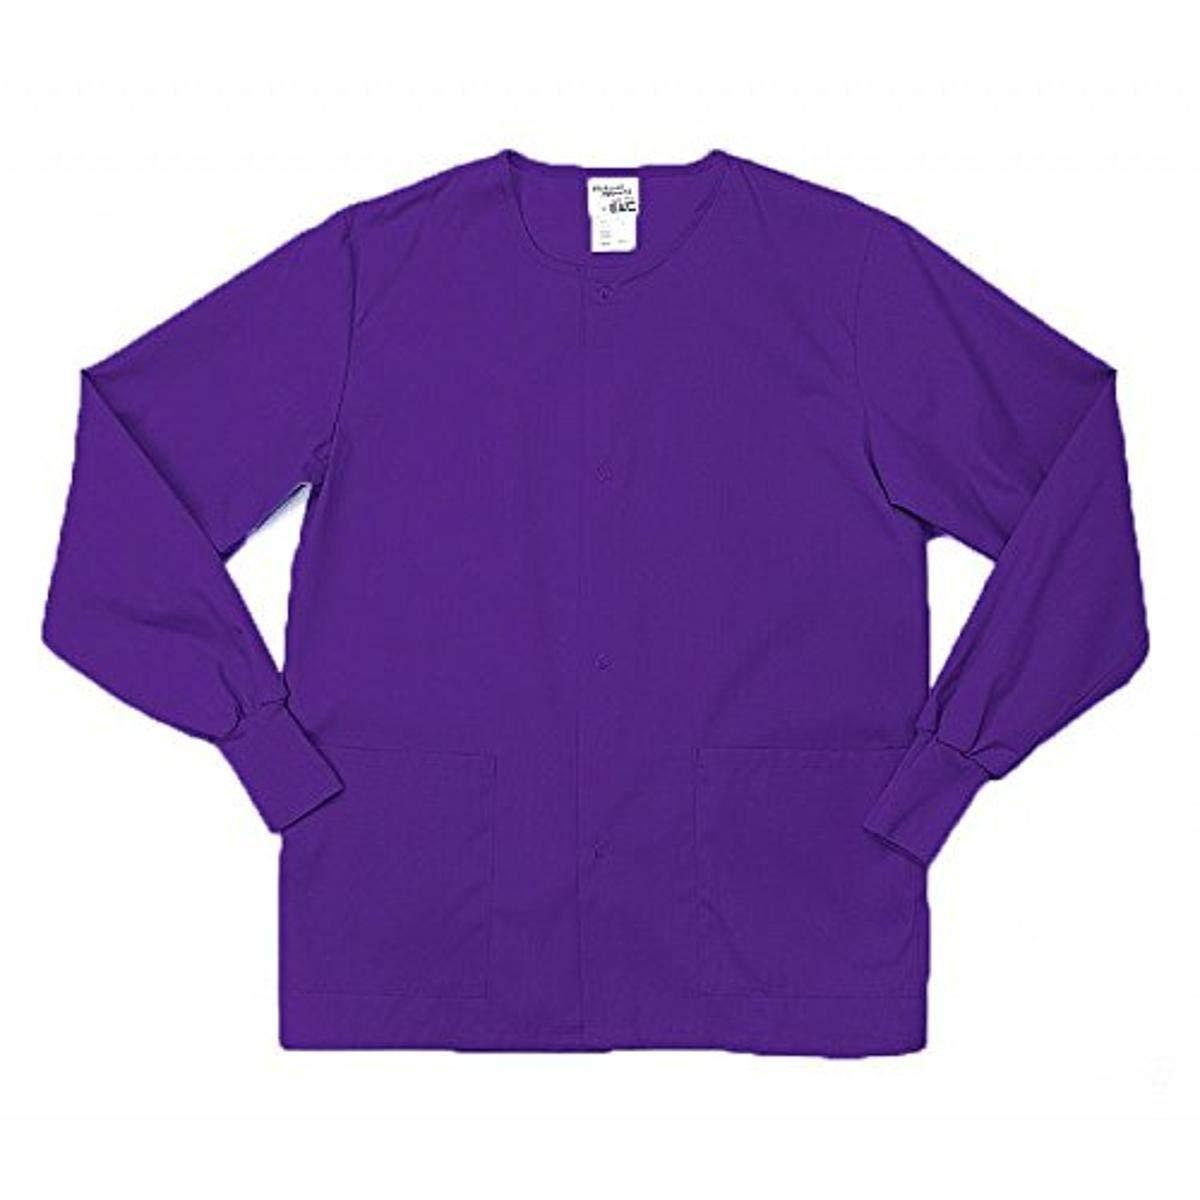 Pinnacle Textile SW68F 4.25 OZ 65/35 Polyester/Cotton, Female Warm UP Jacket-Medium-Purple